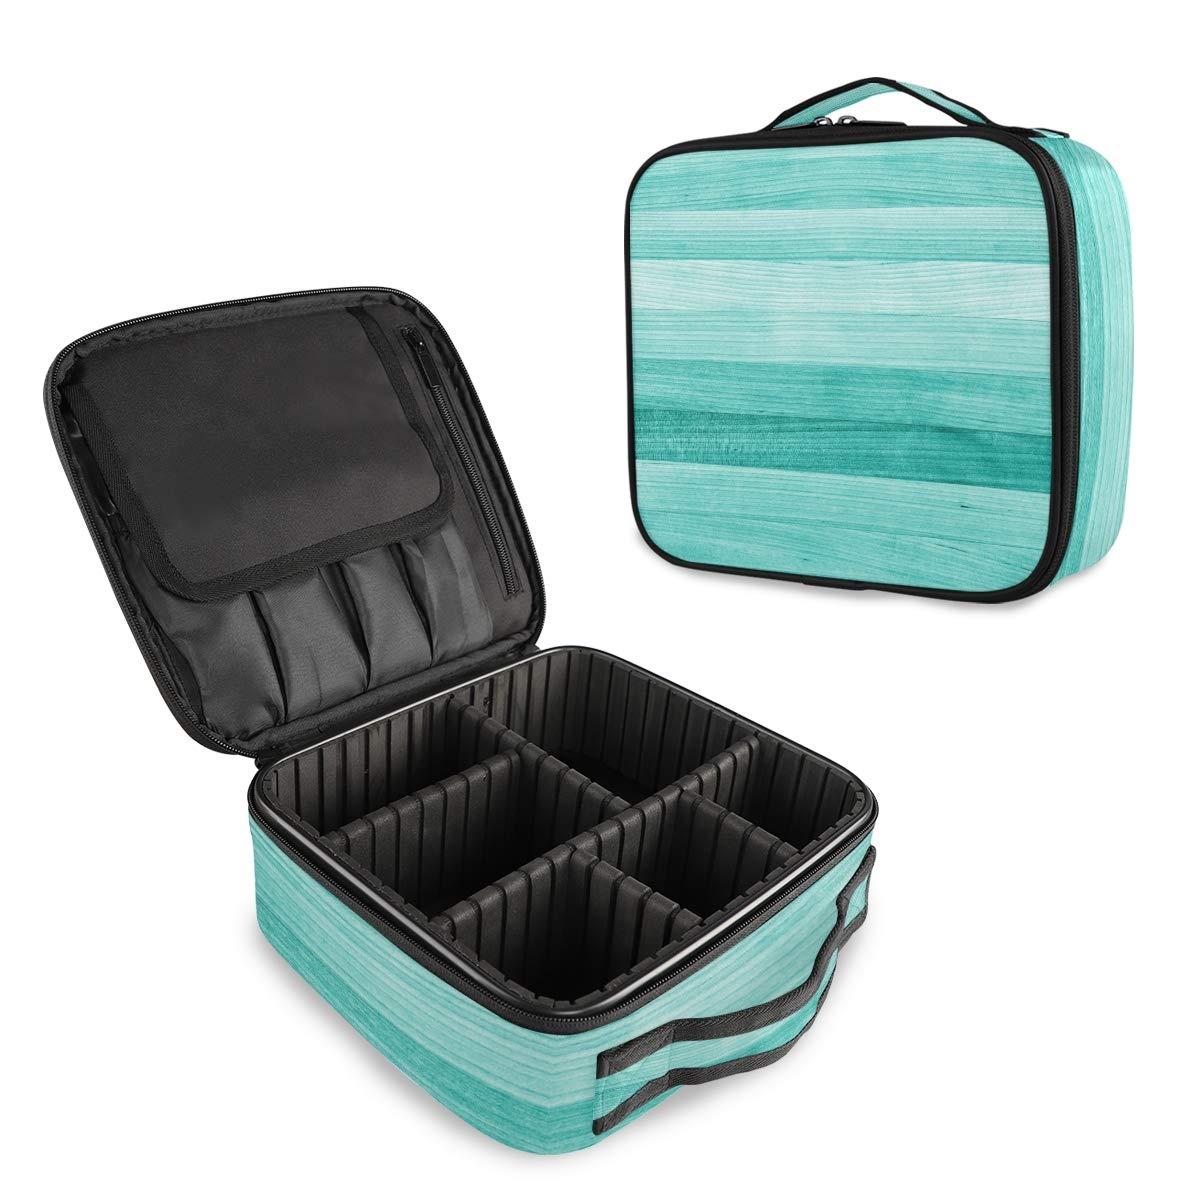 Travel Makeup Case Teal Genuine Ranking TOP7 Turquoise Portable Green Wood Organizer